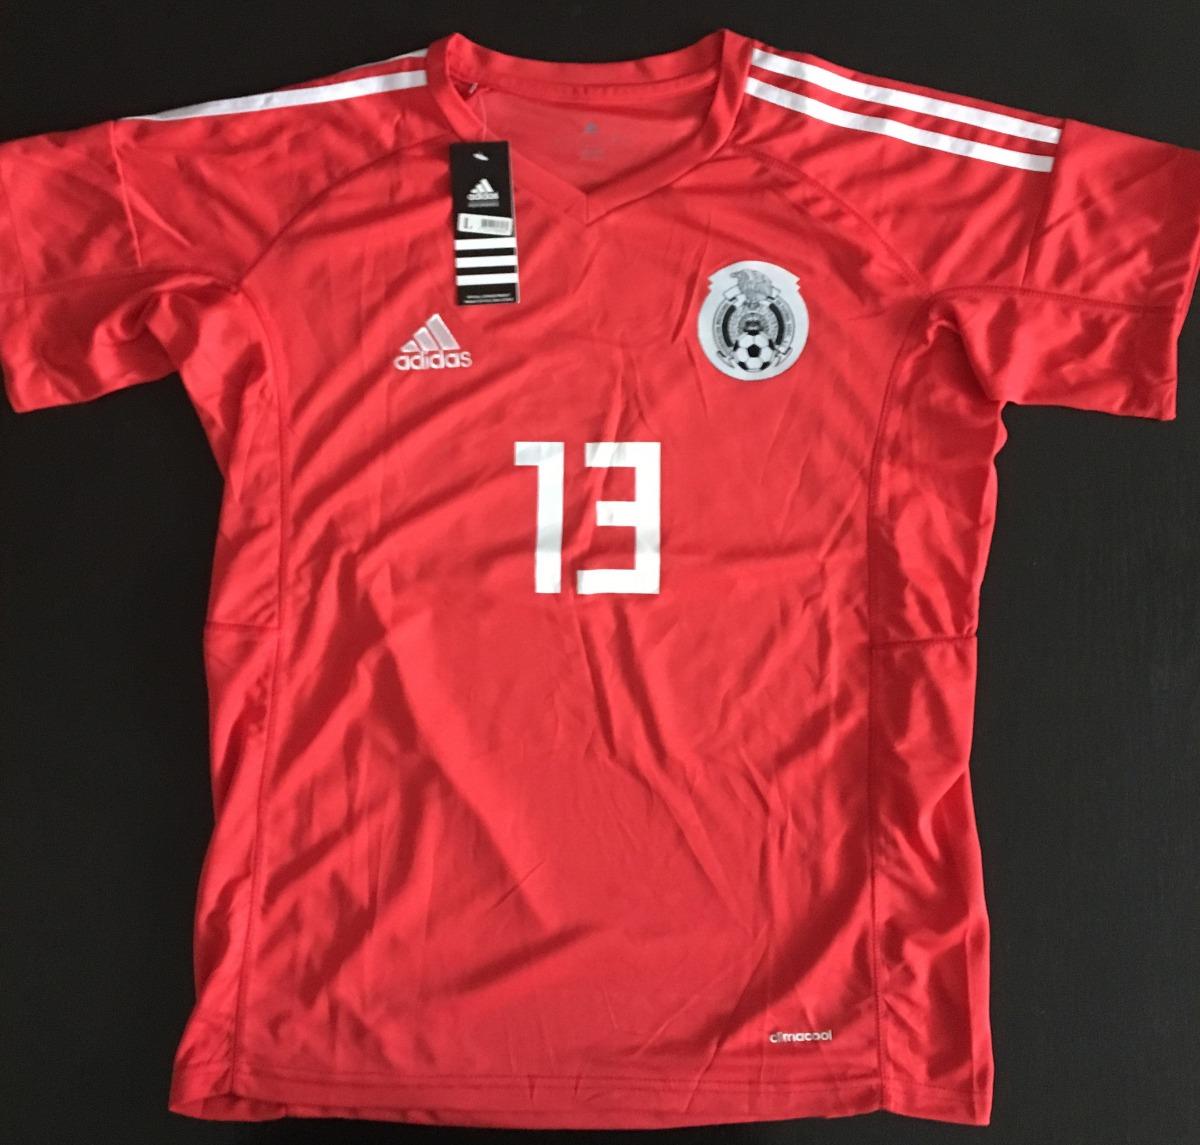 dfac7bce504fe Impresionante jersey portero arquero mexico rojo memo ochoa cargando zoom  jpg 1200x1145 Jersey portero de mexico